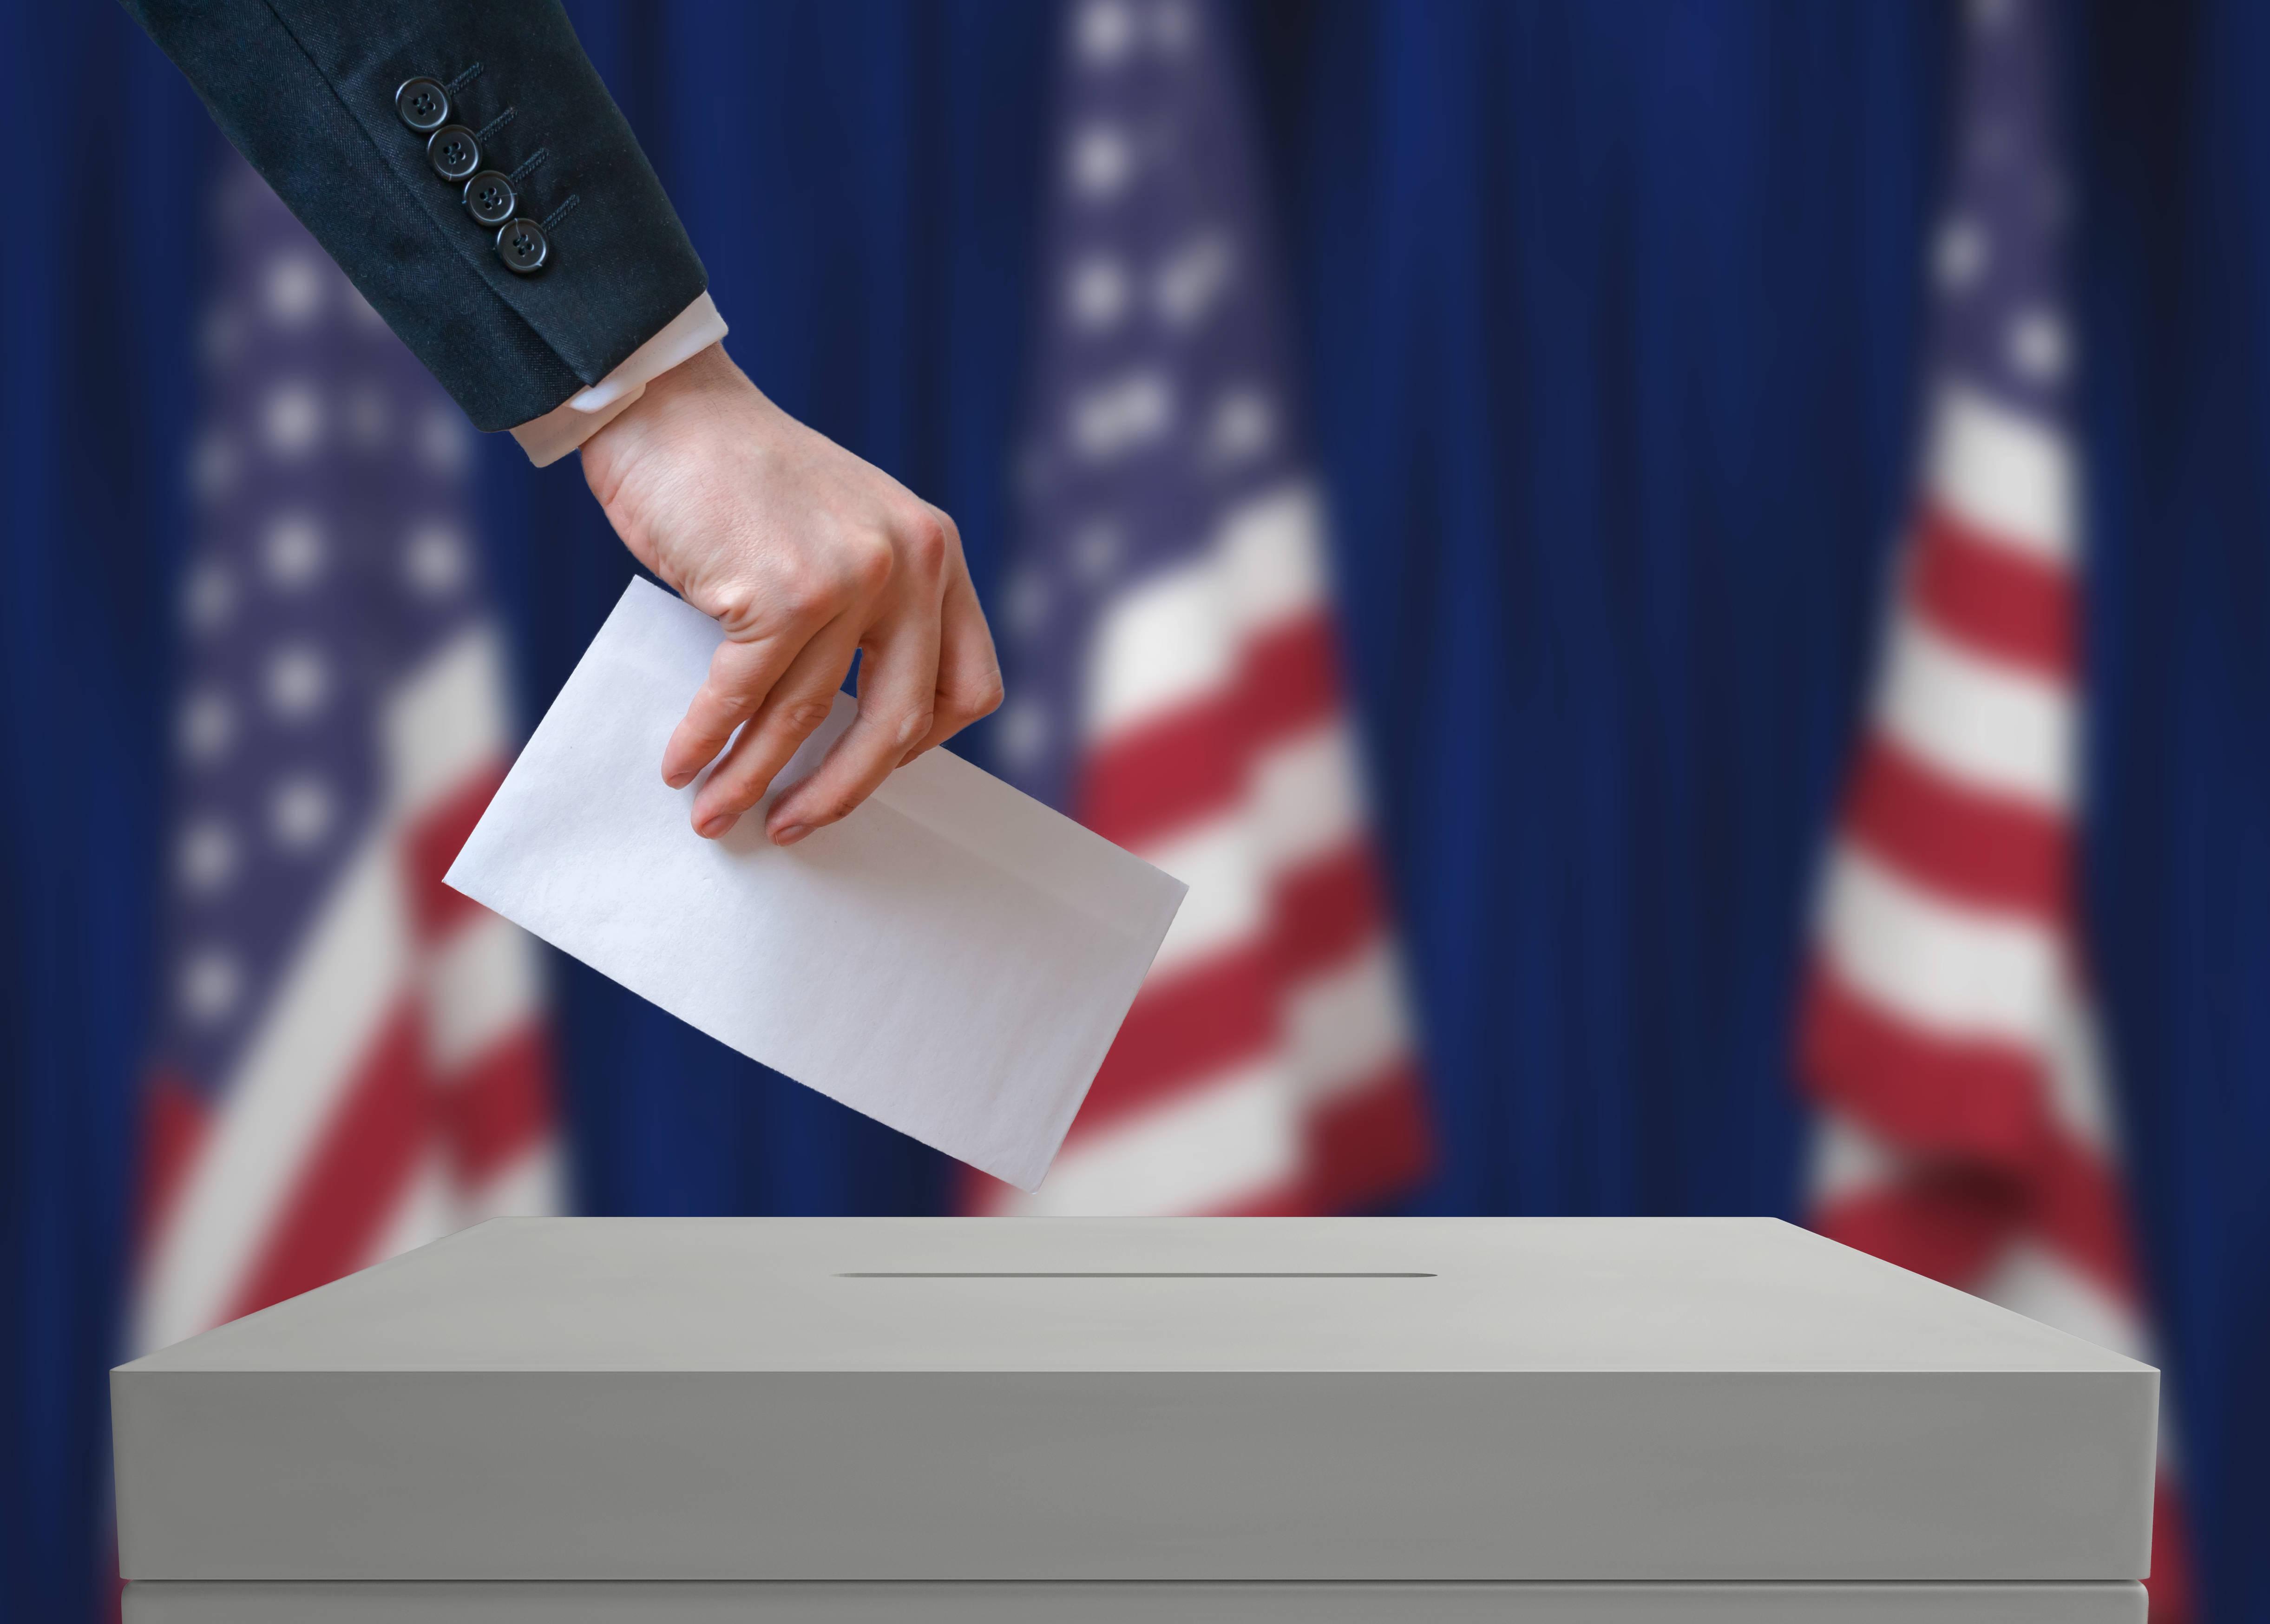 Helmetta's Write-In Candidates Pete Karczewski And Michael Duffy Win Council Seats